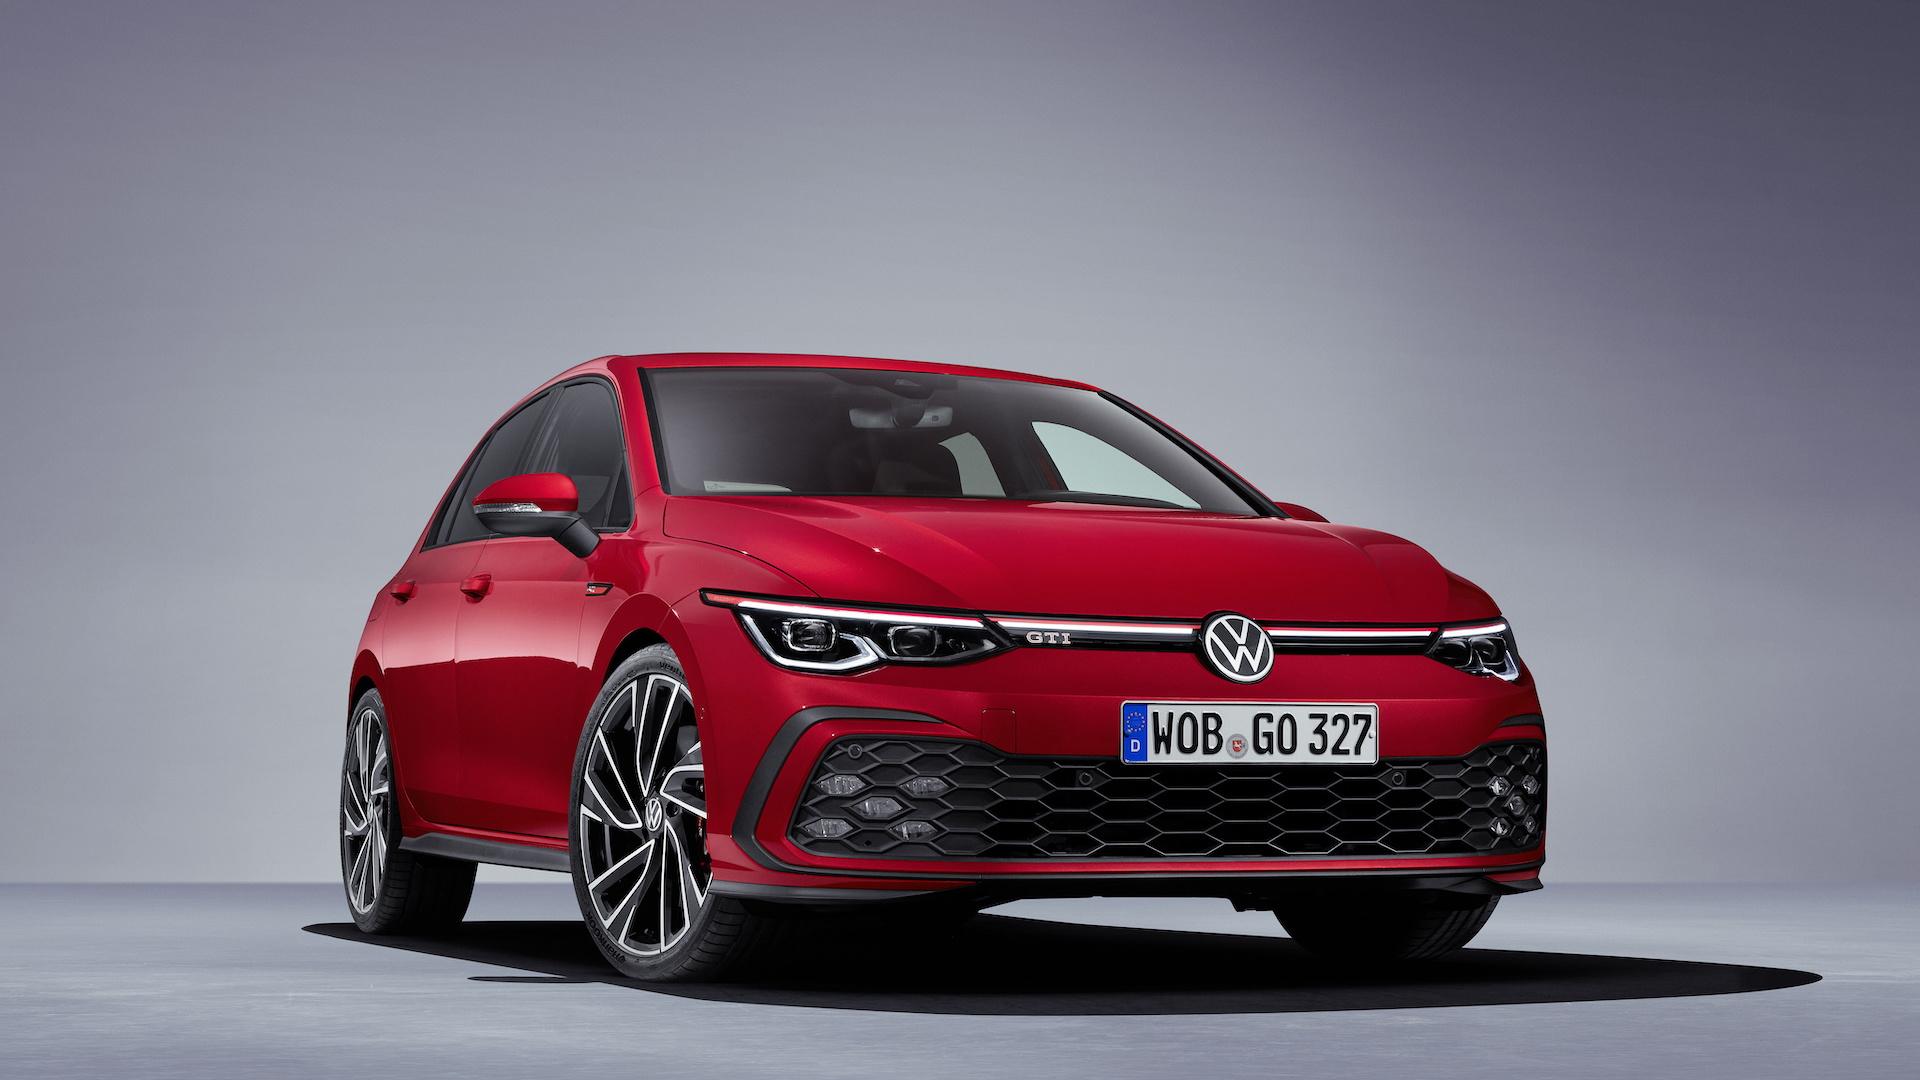 2022 Volkswagen Golf GTI